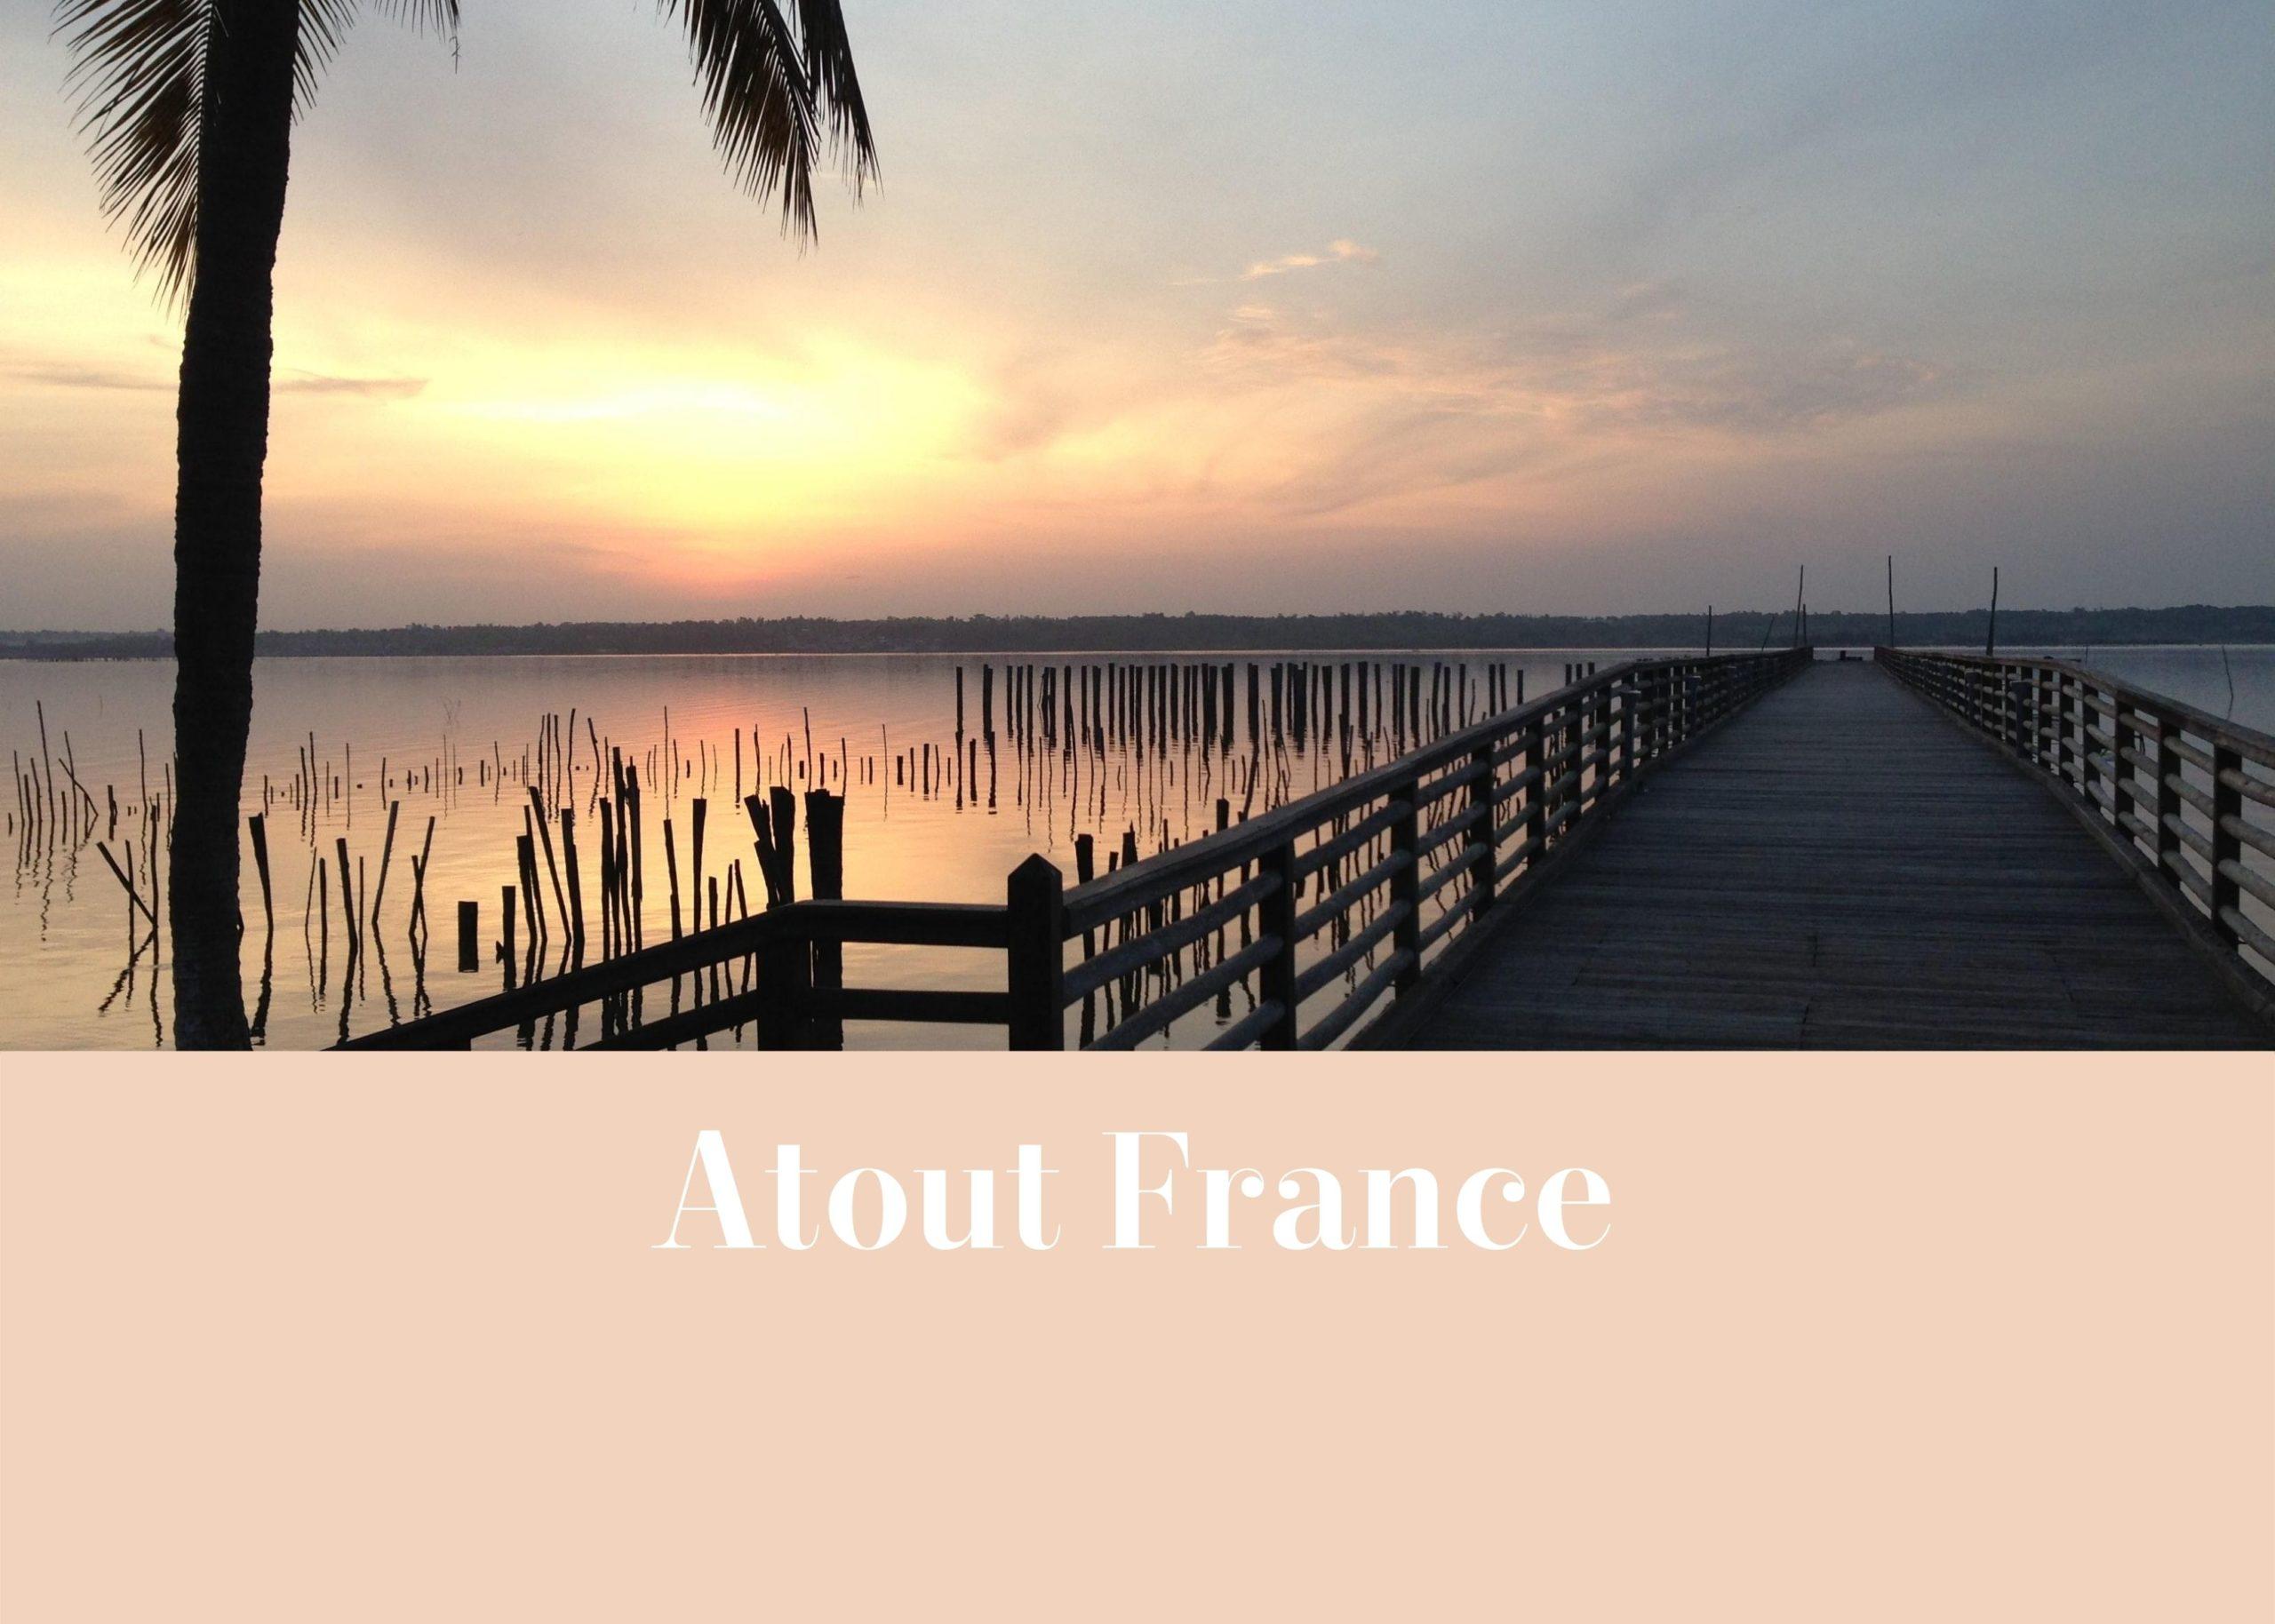 Atout France Benin